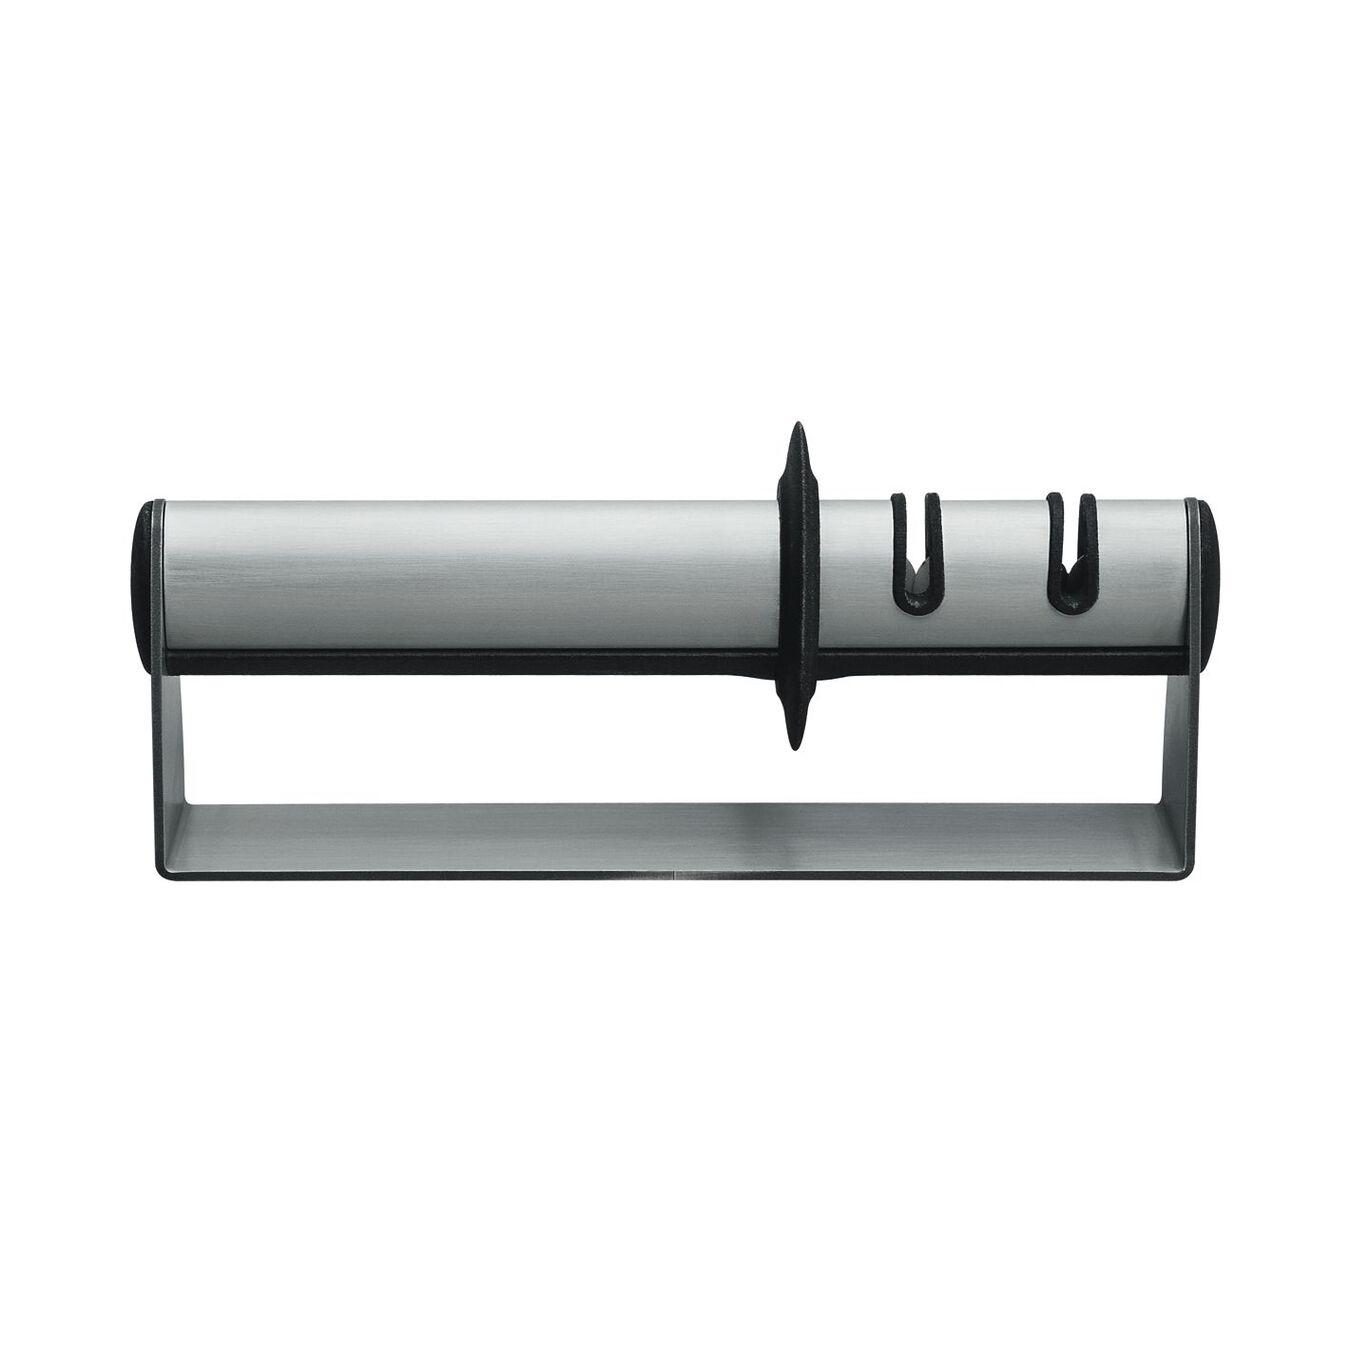 Knife sharpener, 19 cm | silver | stainless steel,,large 1